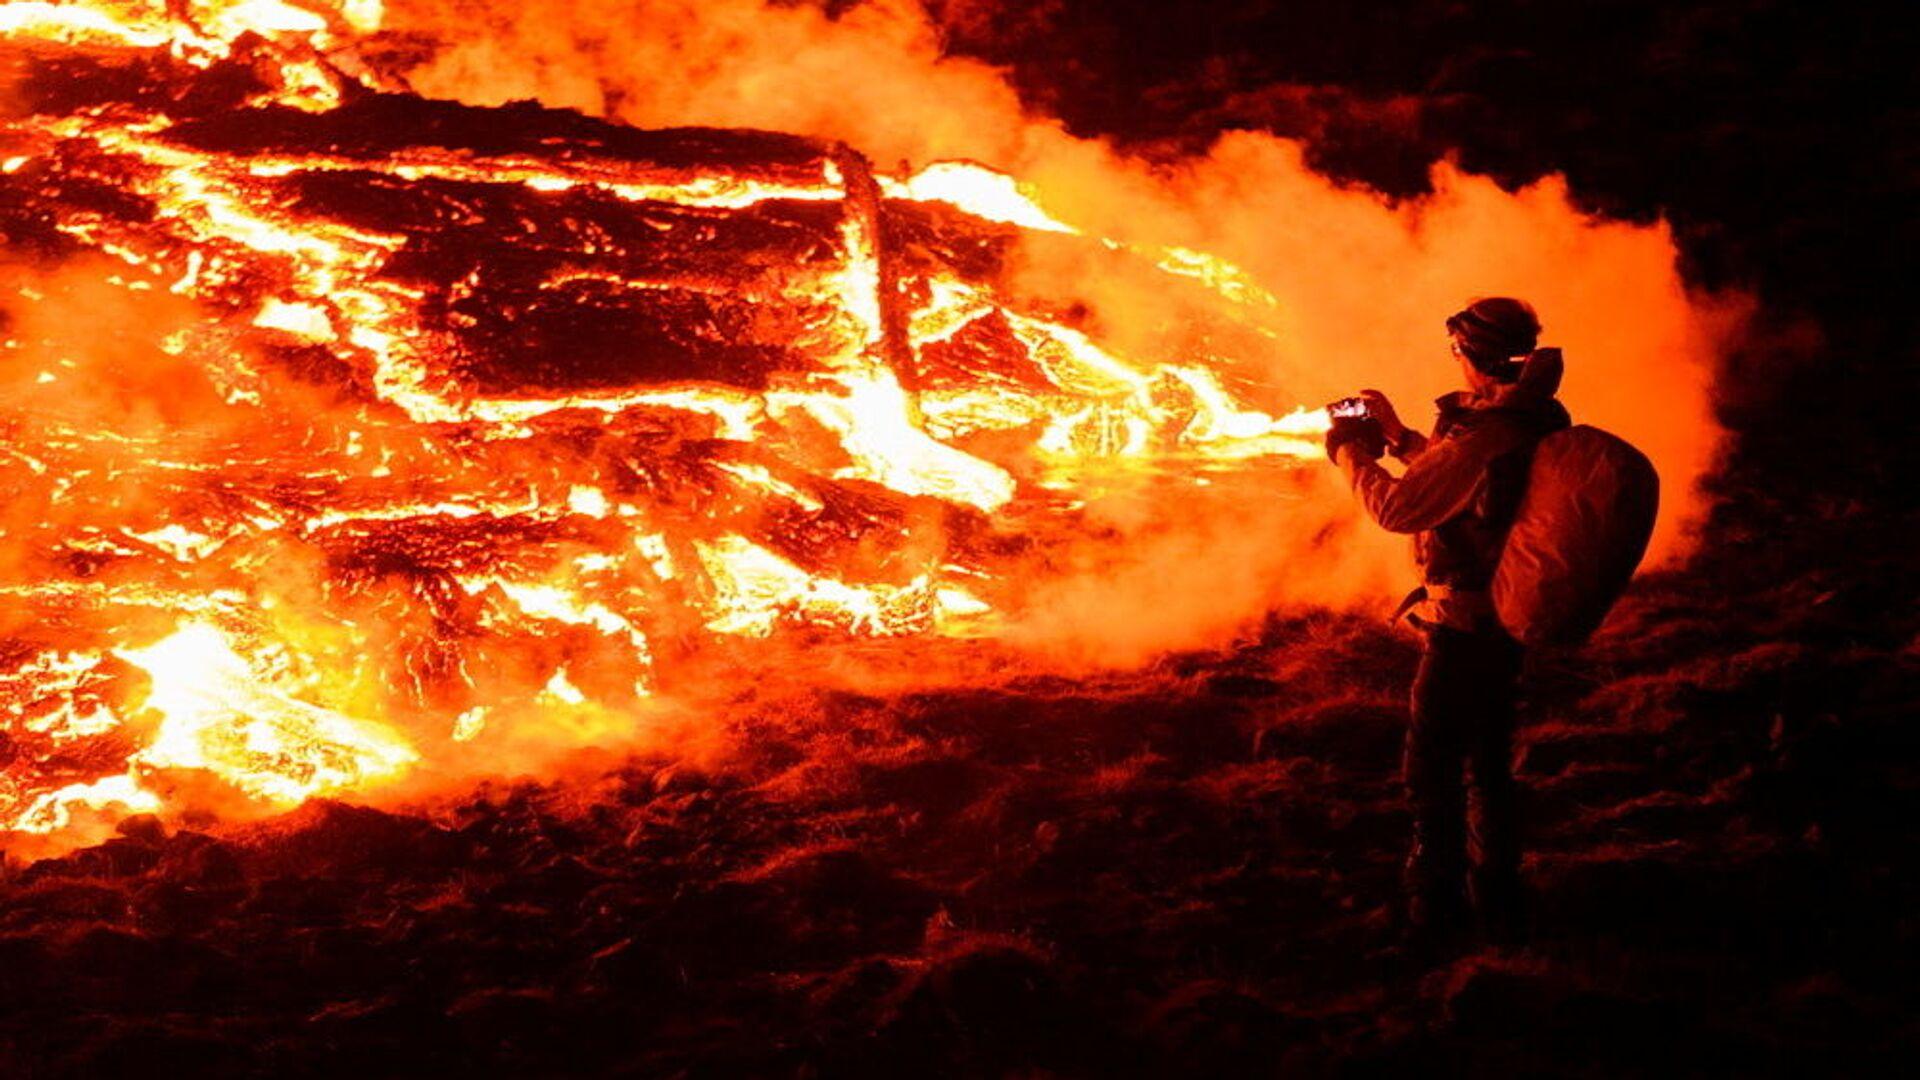 Erupcja wulkanu Fagradalsfjall w Islandii - Sputnik Polska, 1920, 23.09.2021